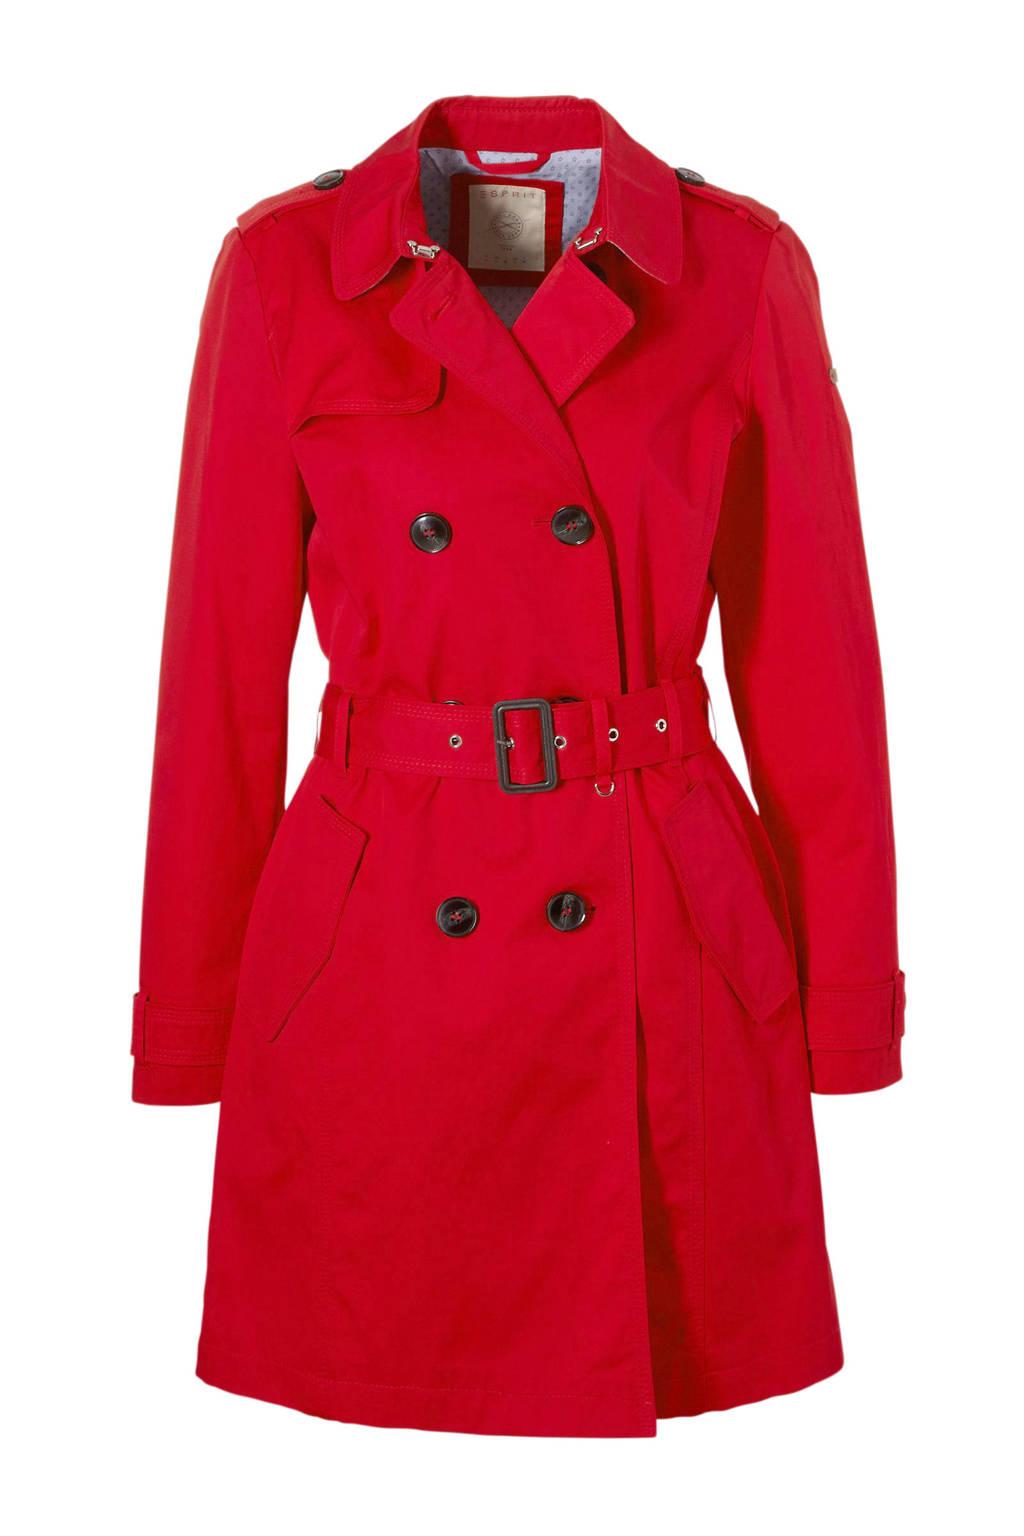 ESPRIT Women Casual trenchcoat rood, Rood